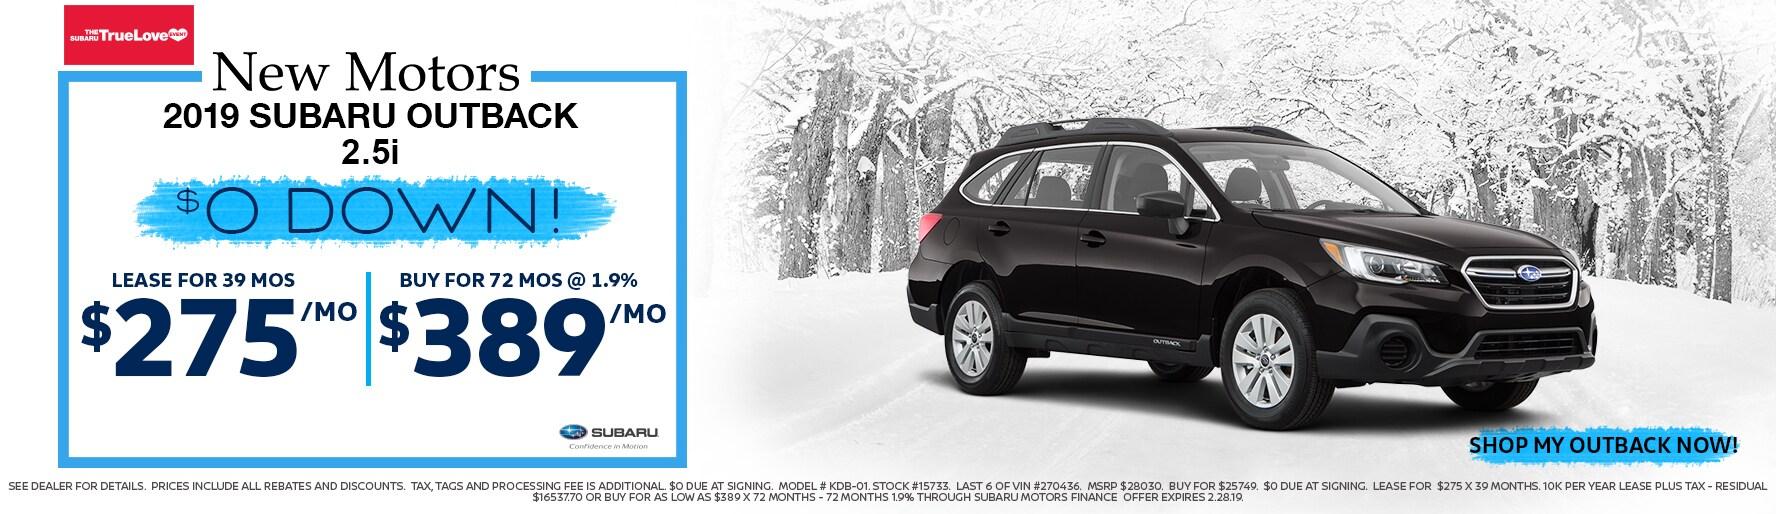 New Motors Subaru Erie Pa >> Erie New Motors New Used Subaru Volkswagen And Bmw Cars